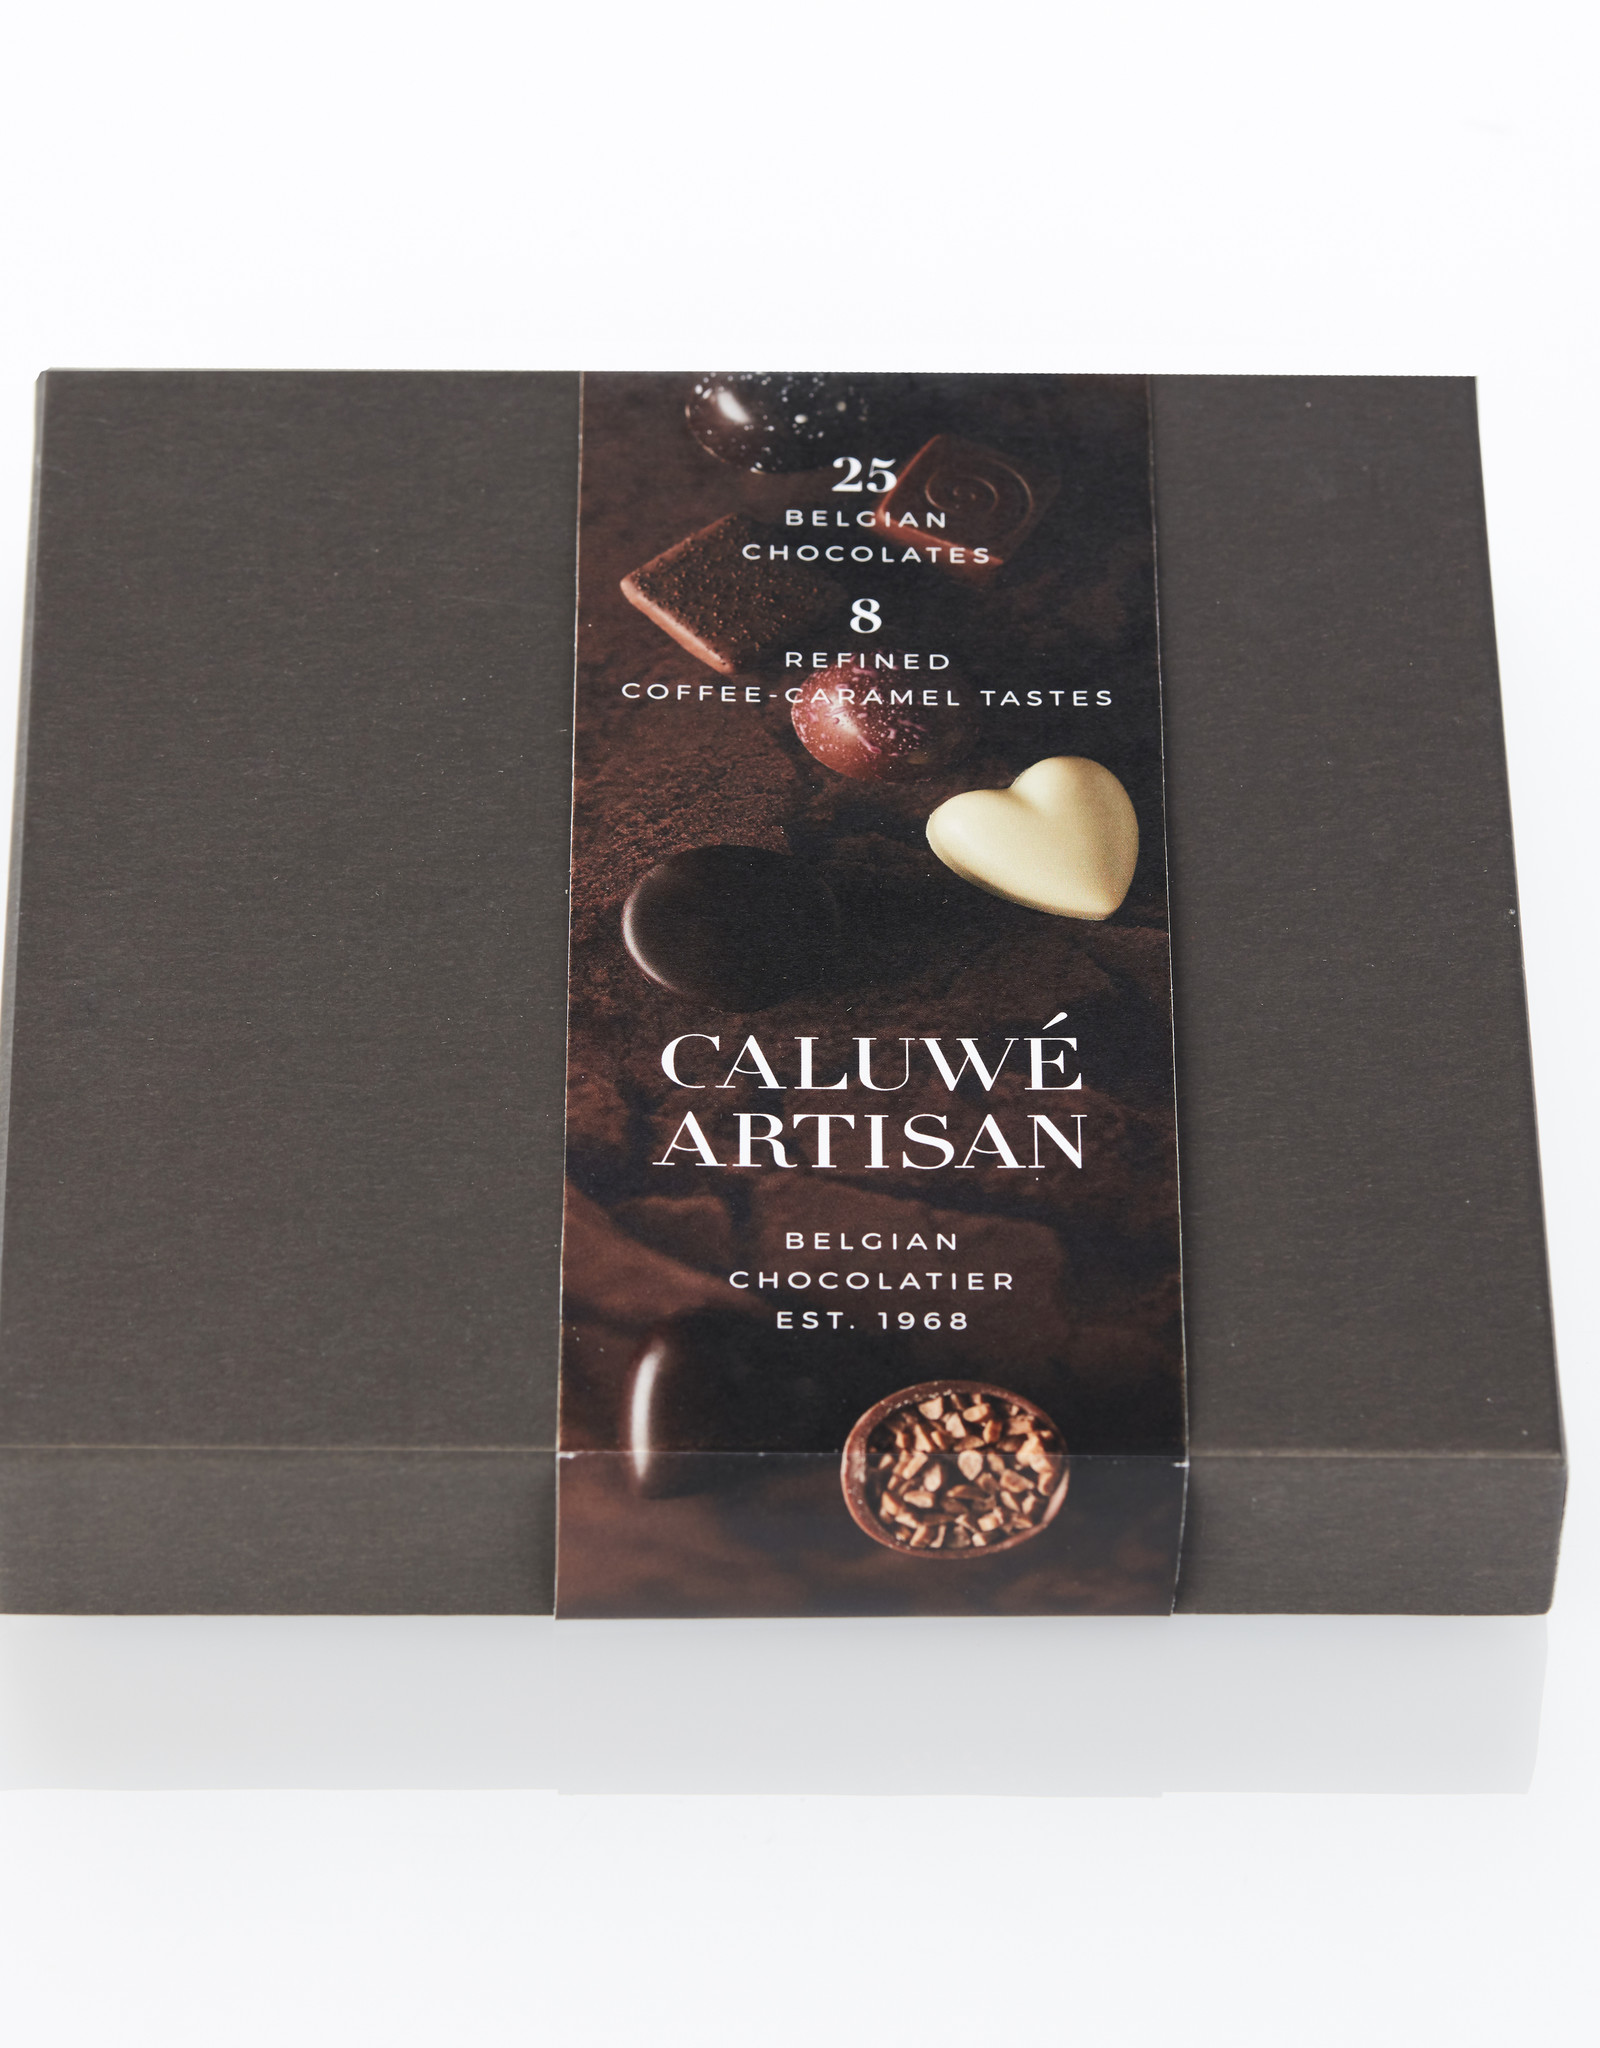 Caluwe Artisan Rigid box 330g - coffee/caramel assortment - UTZ